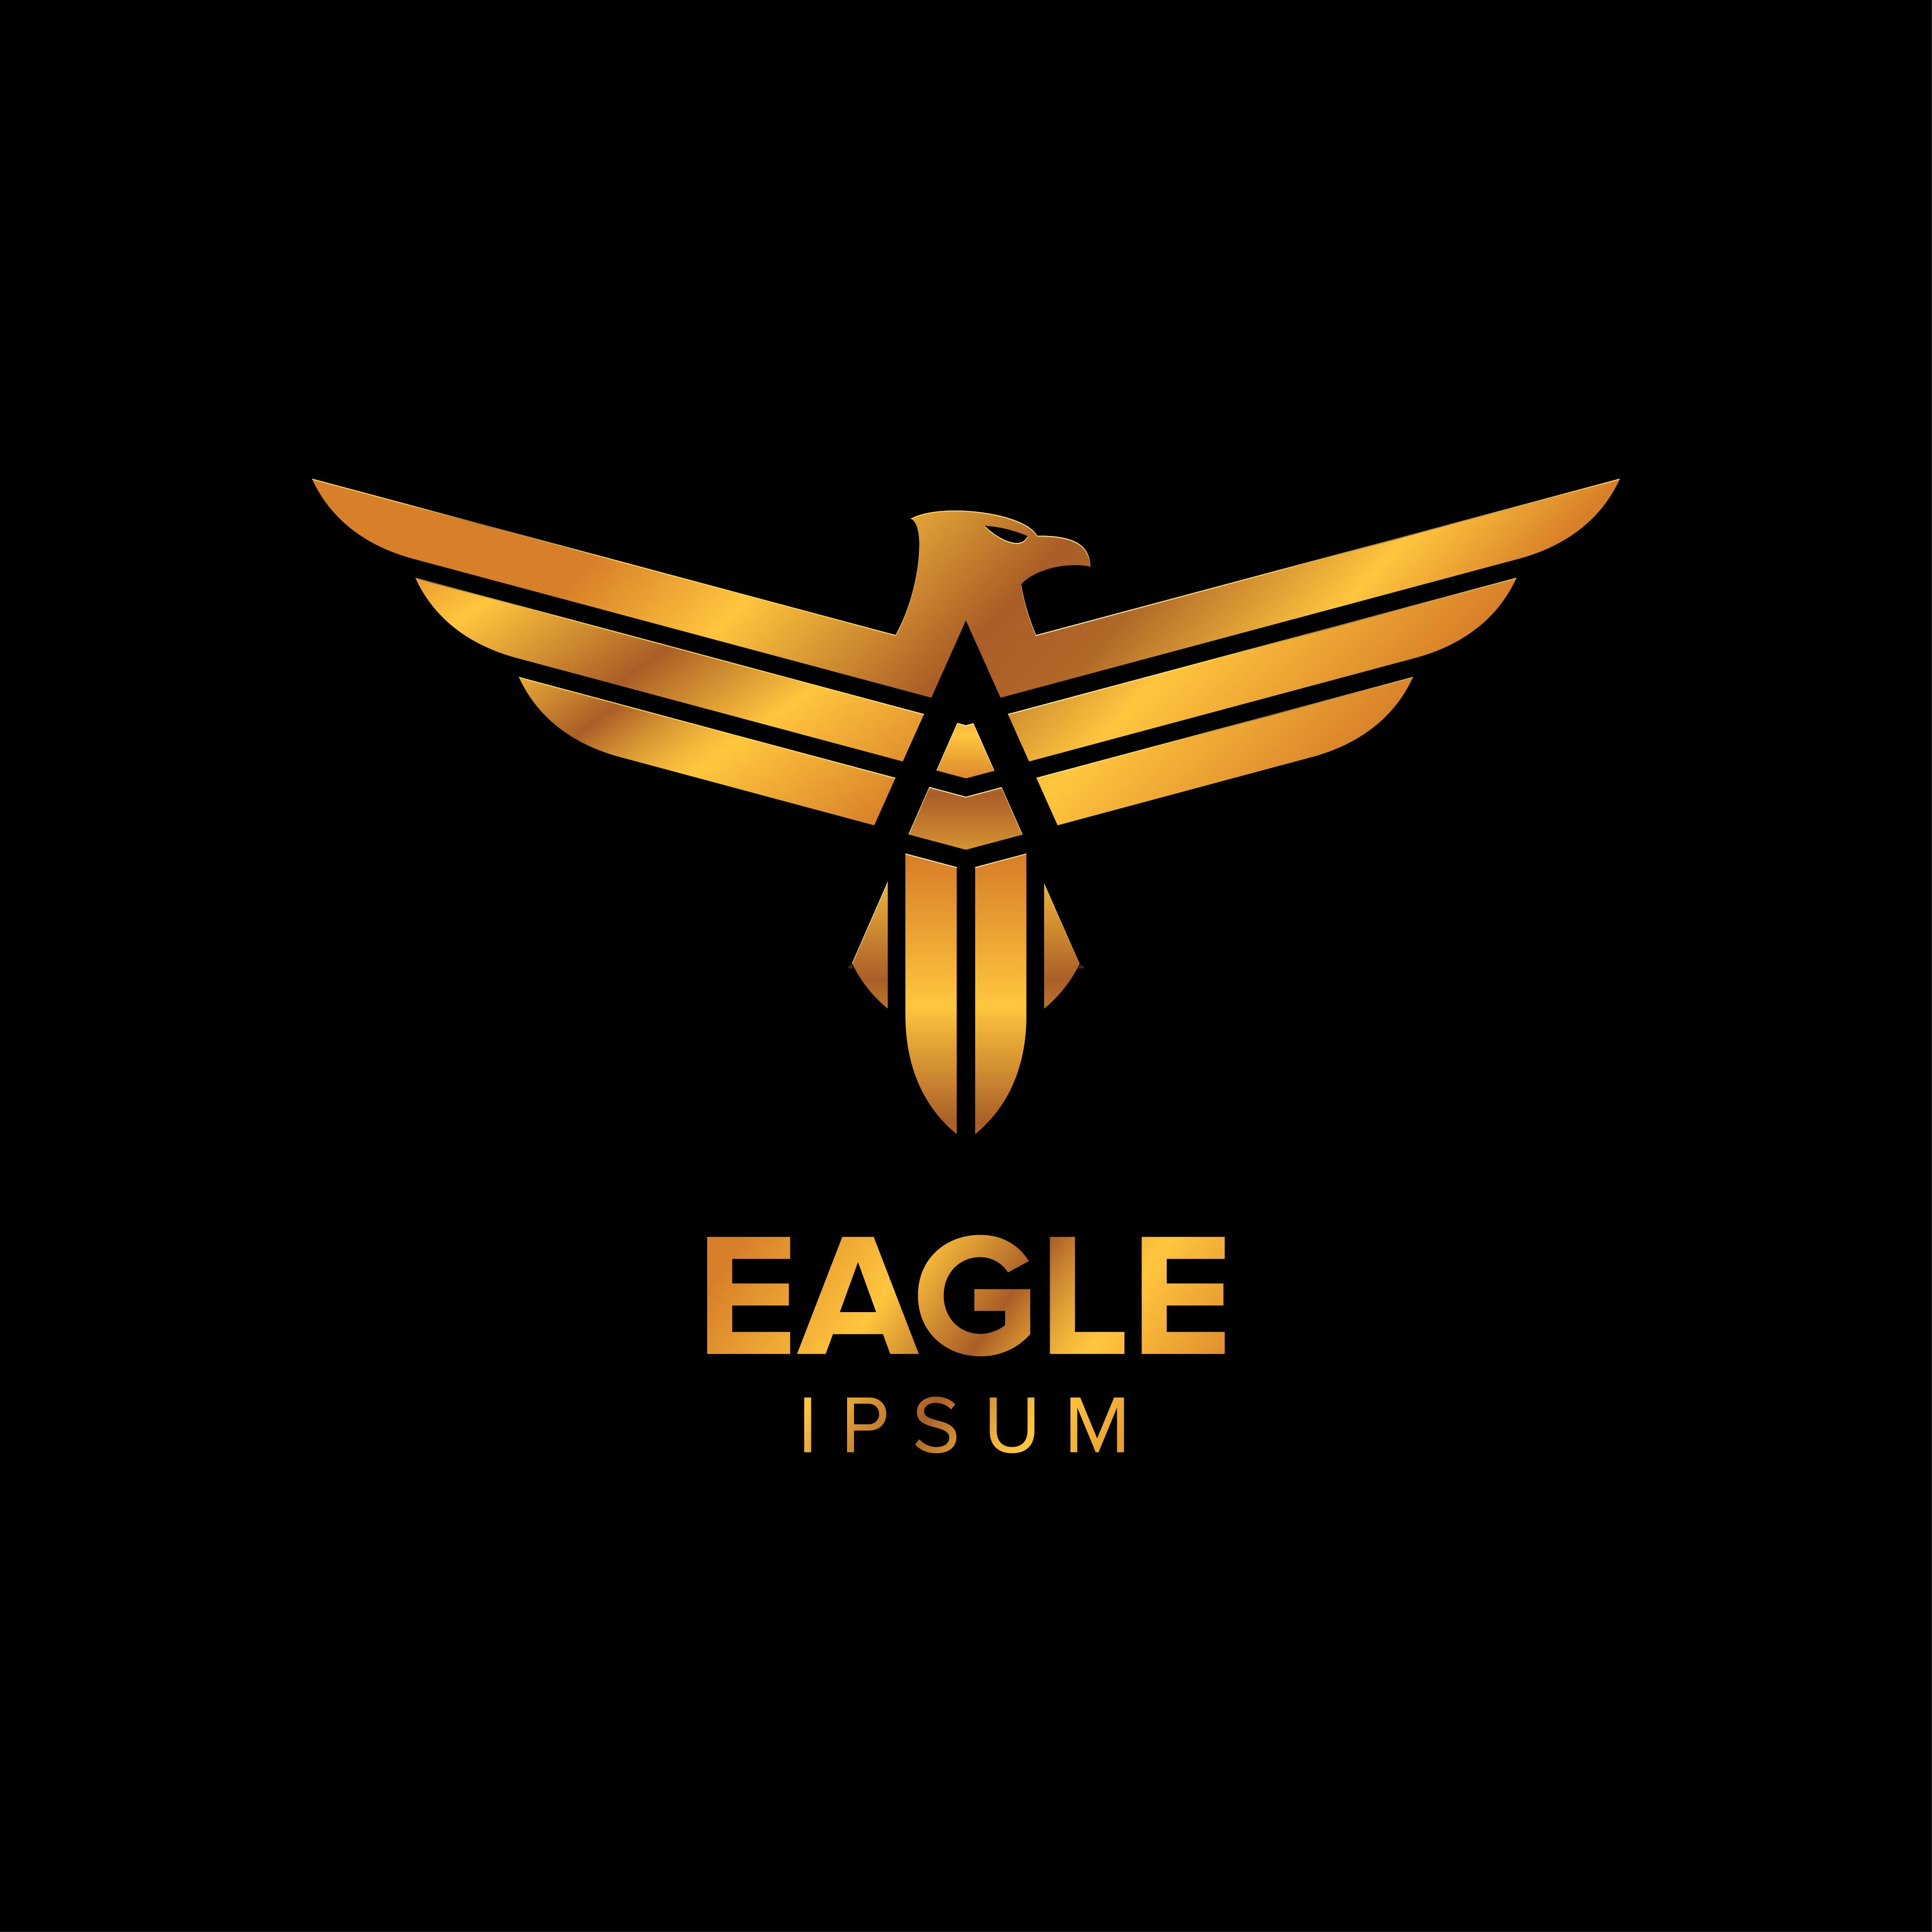 Creative Luxury Eagle Logo Design Concept Design With Gold